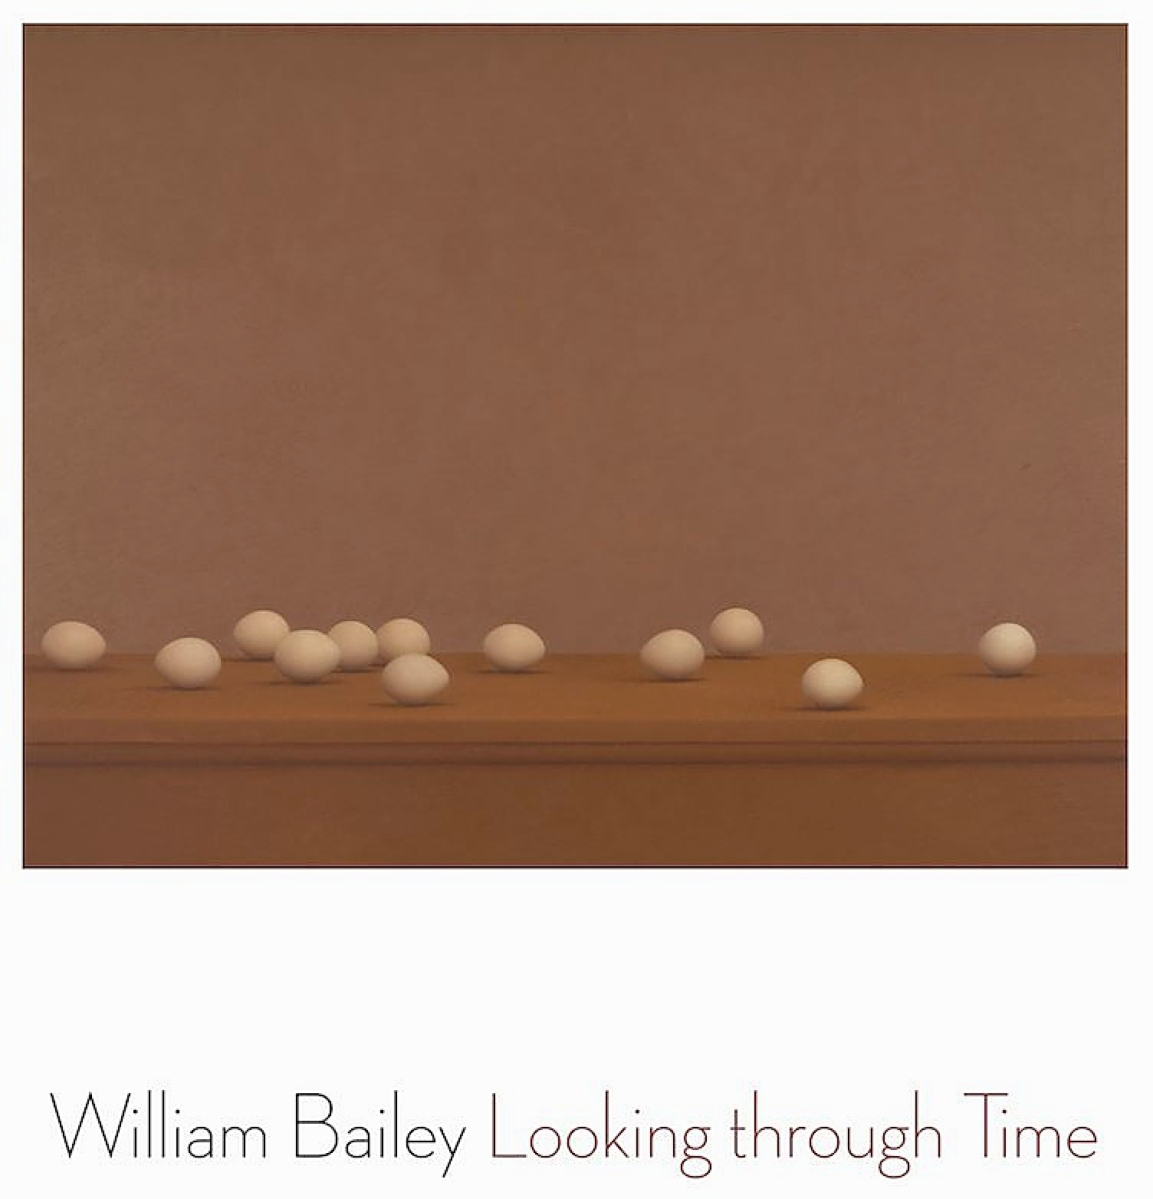 williambailey